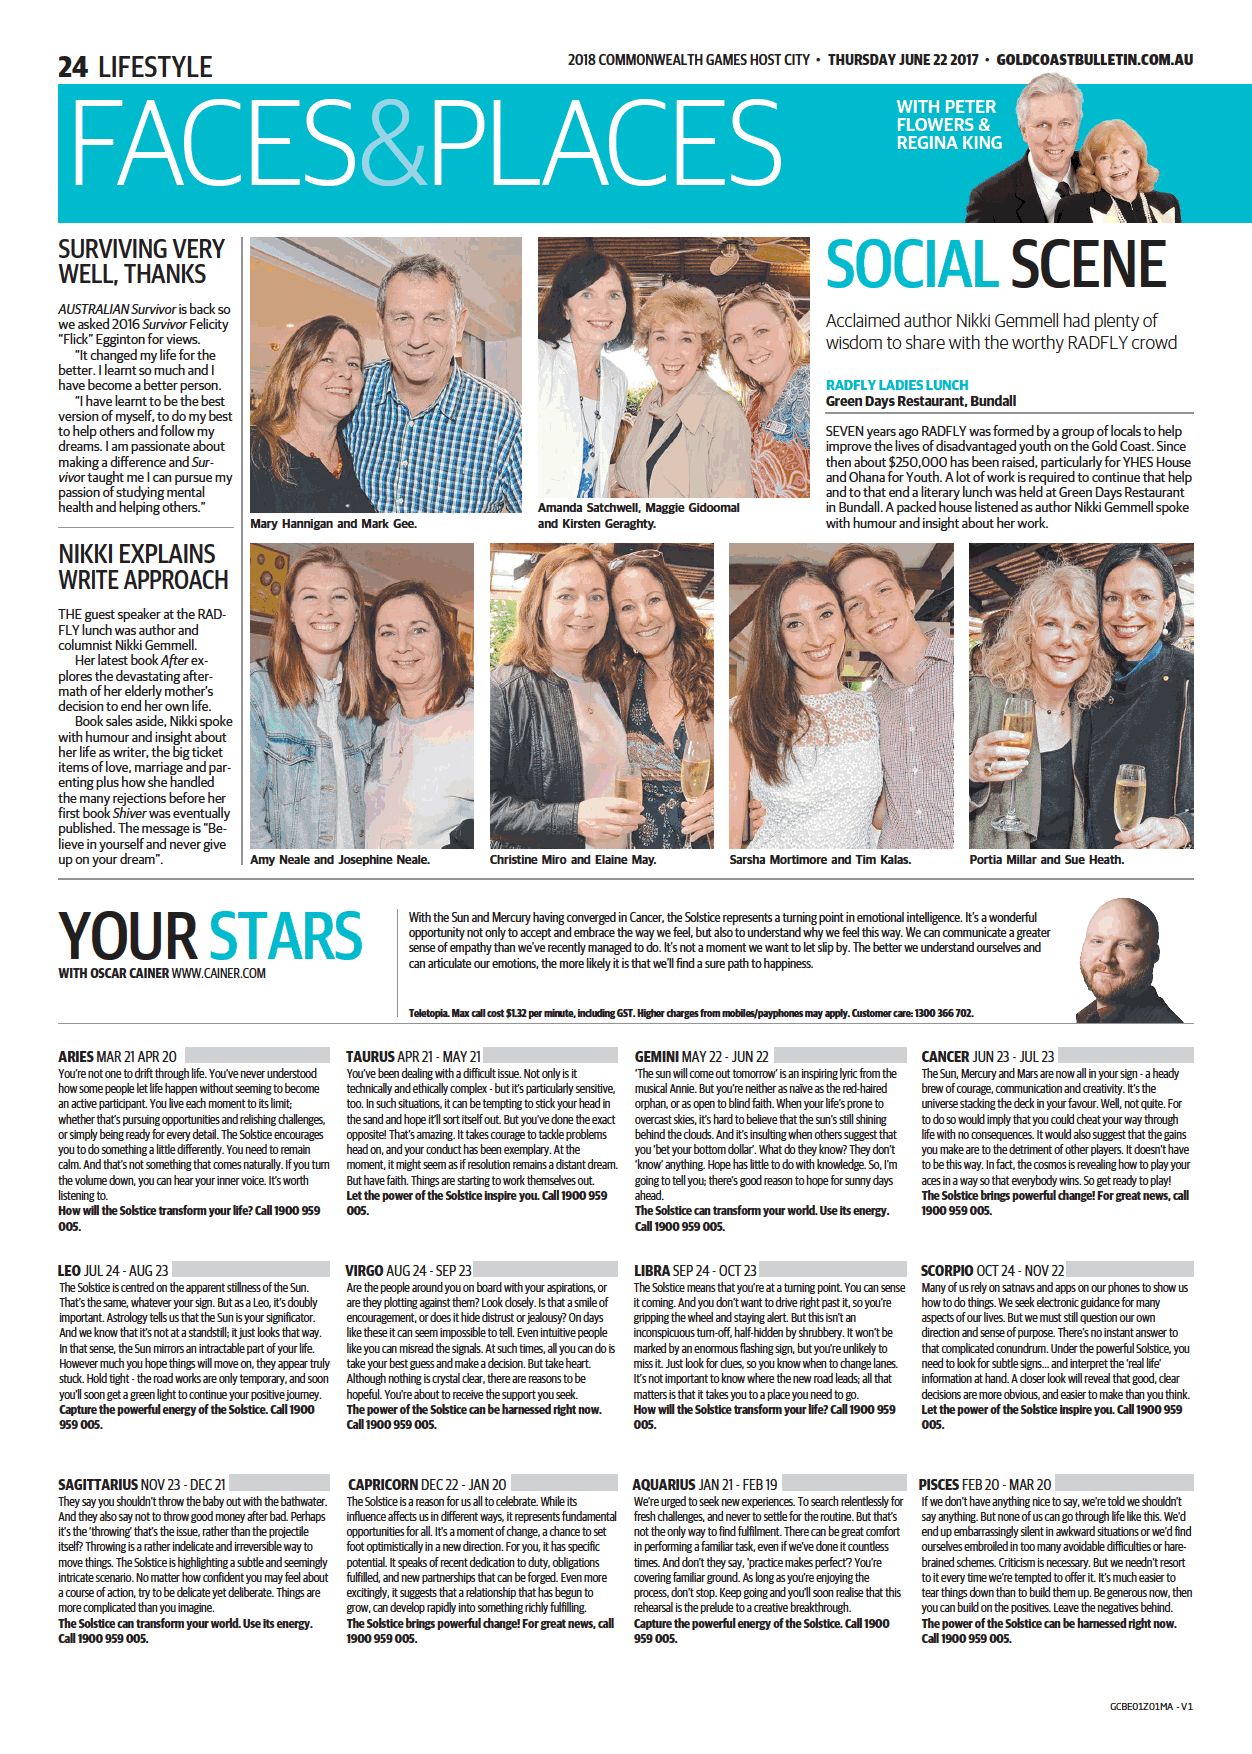 Gold Coast Bulletin - 22 June 17 - pg 1